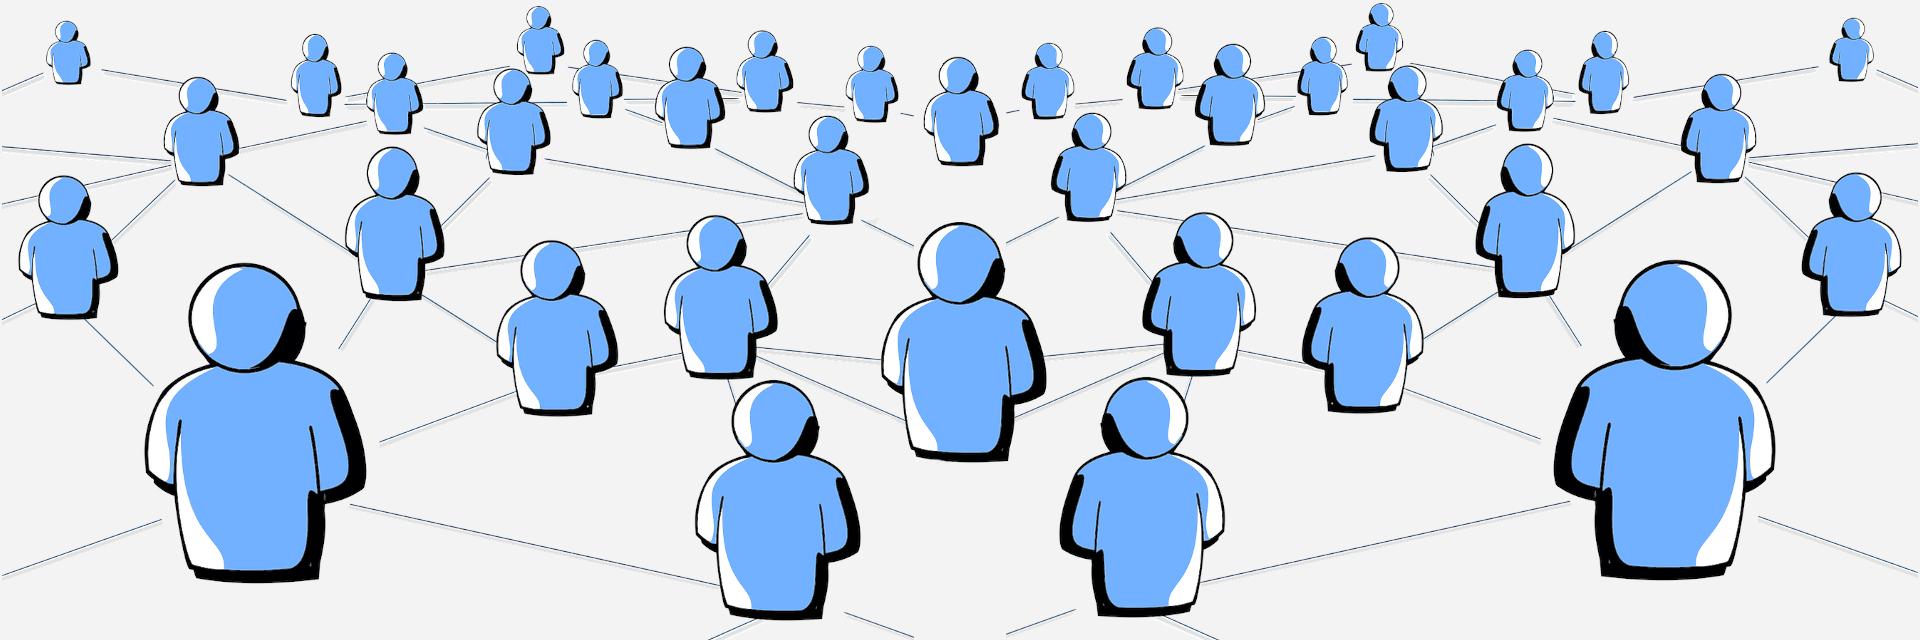 apprendimento sociale e-learning